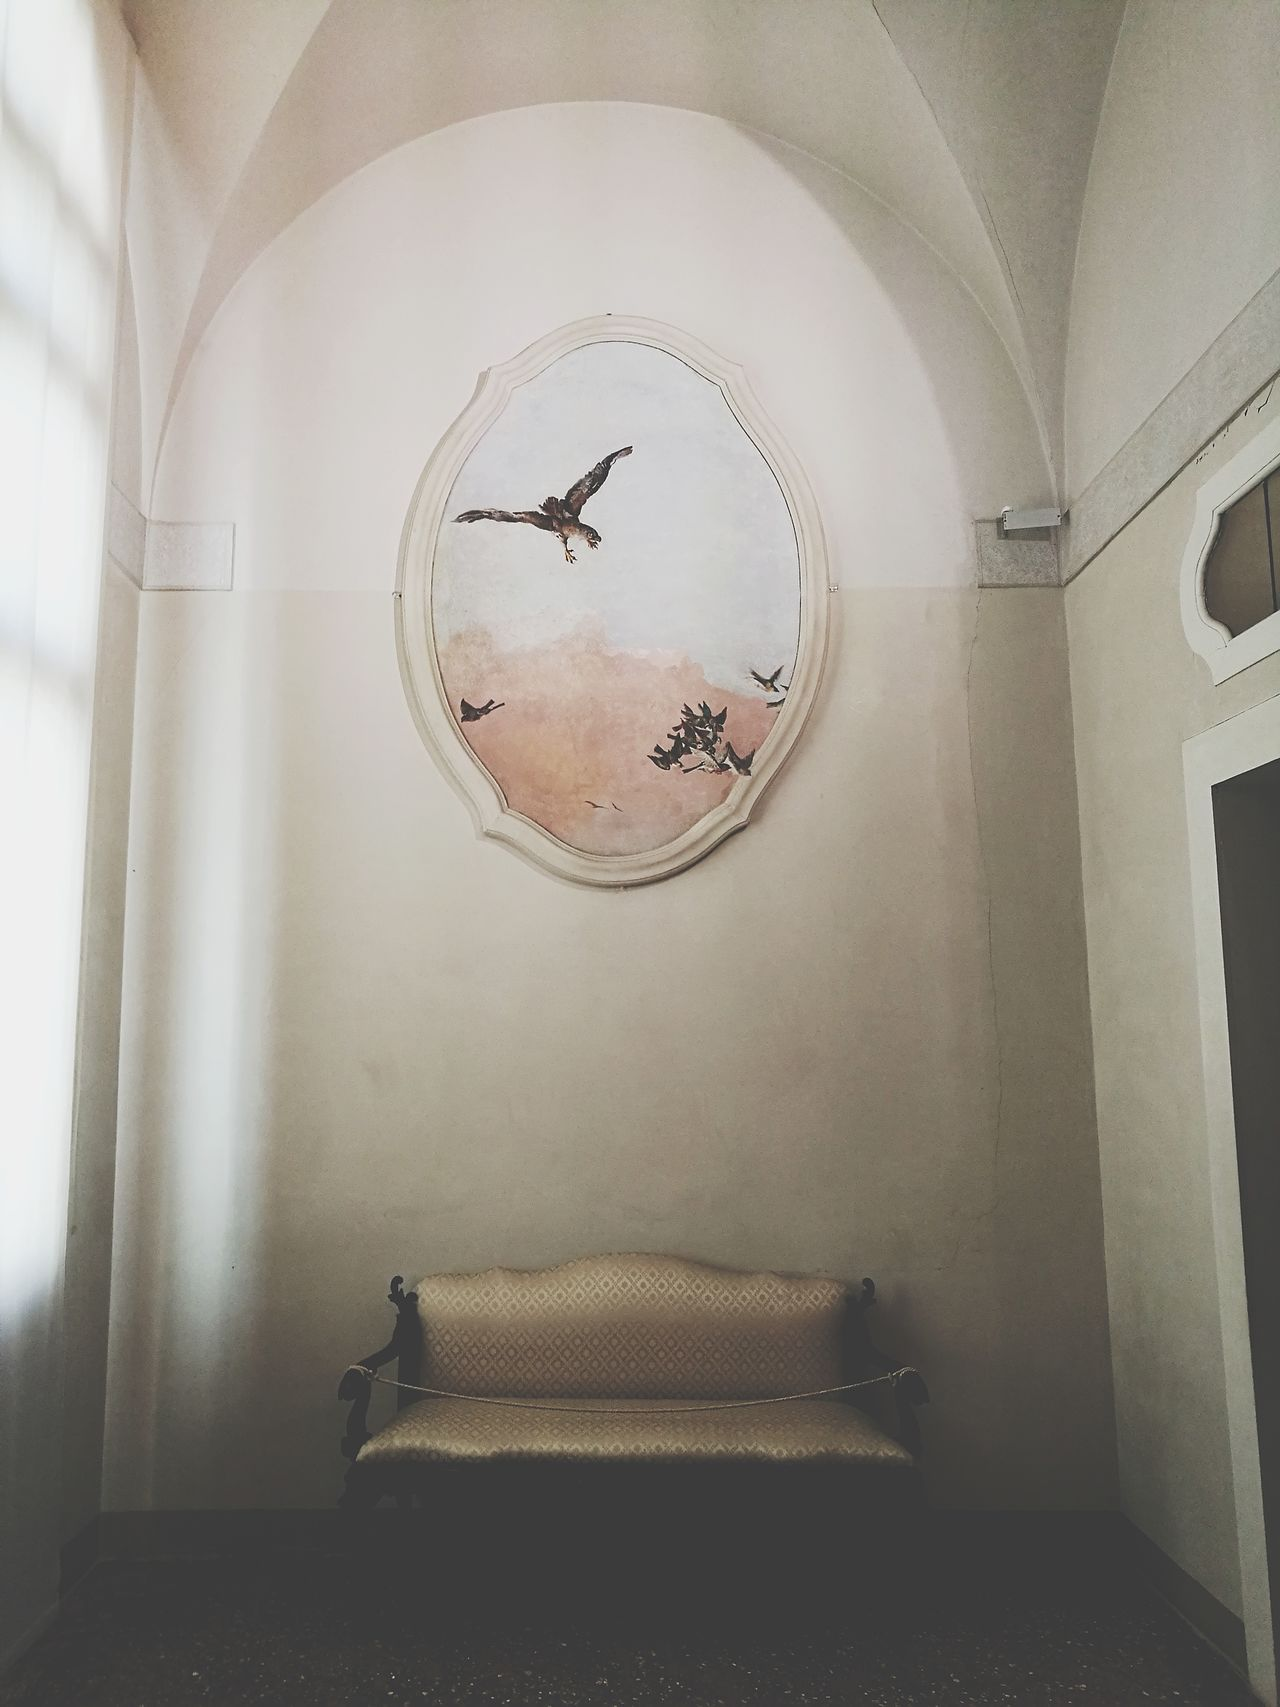 Palace Cà Rezzonico Indoors  Painting Minimalism Birds Chair Museum Venice, Italy